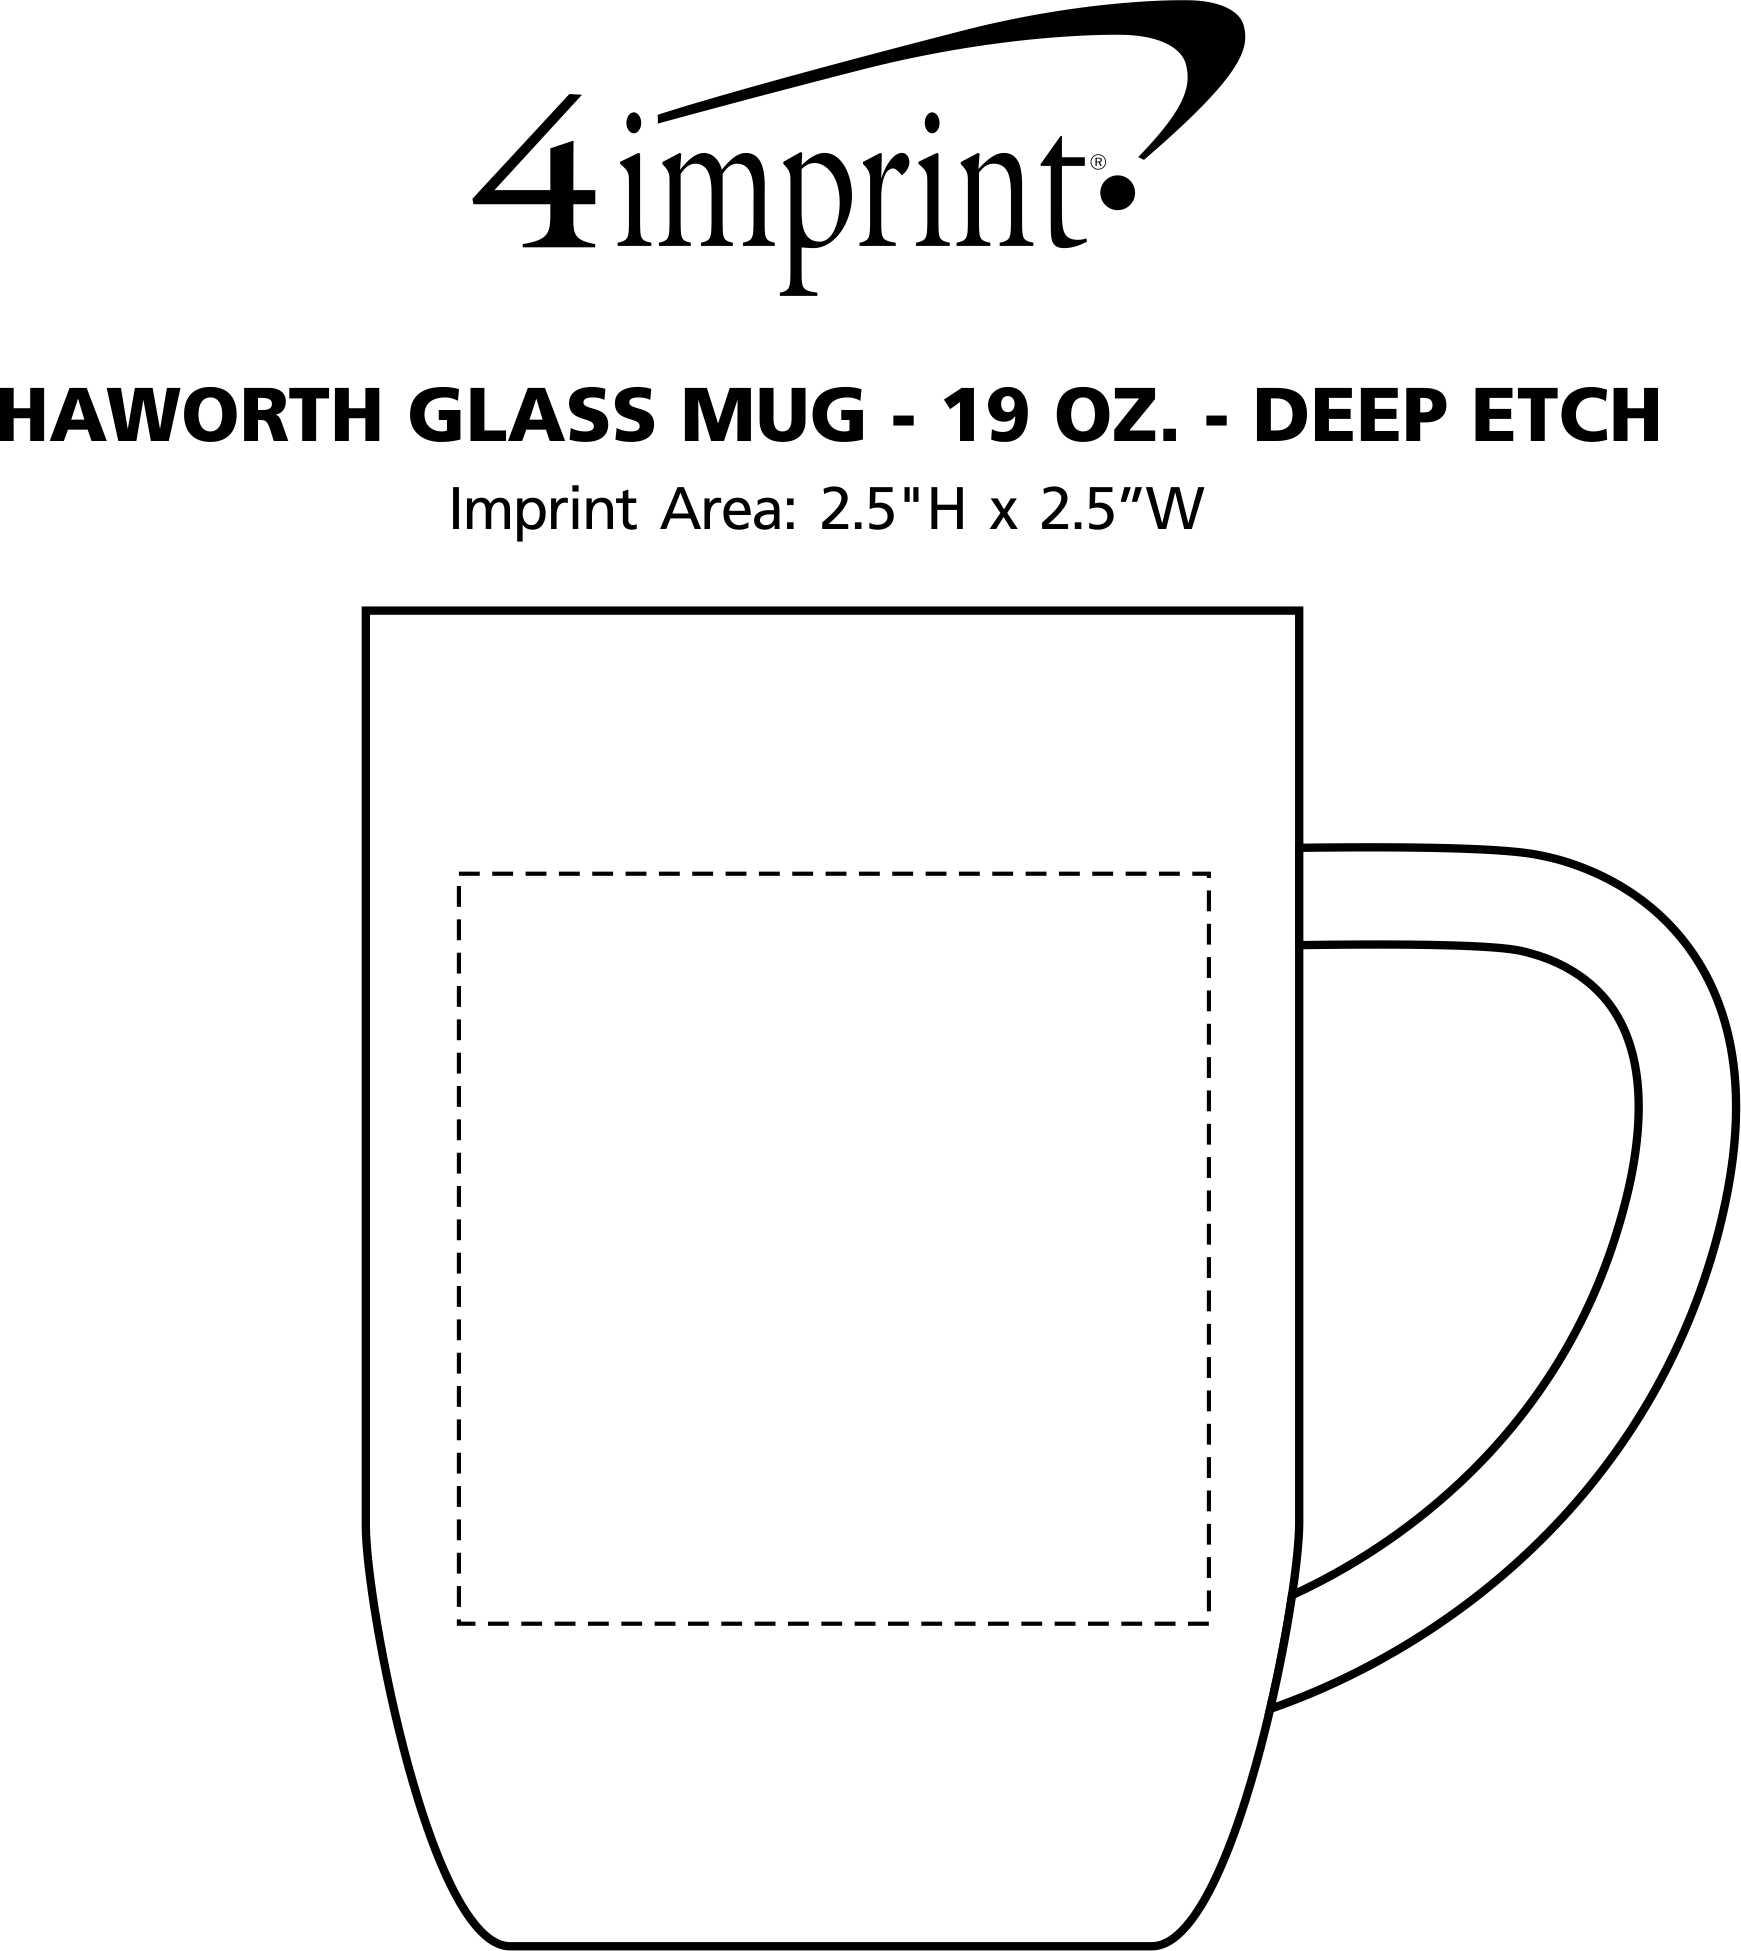 Imprint Area of Haworth Glass Mug - 19 oz. - Deep Etch